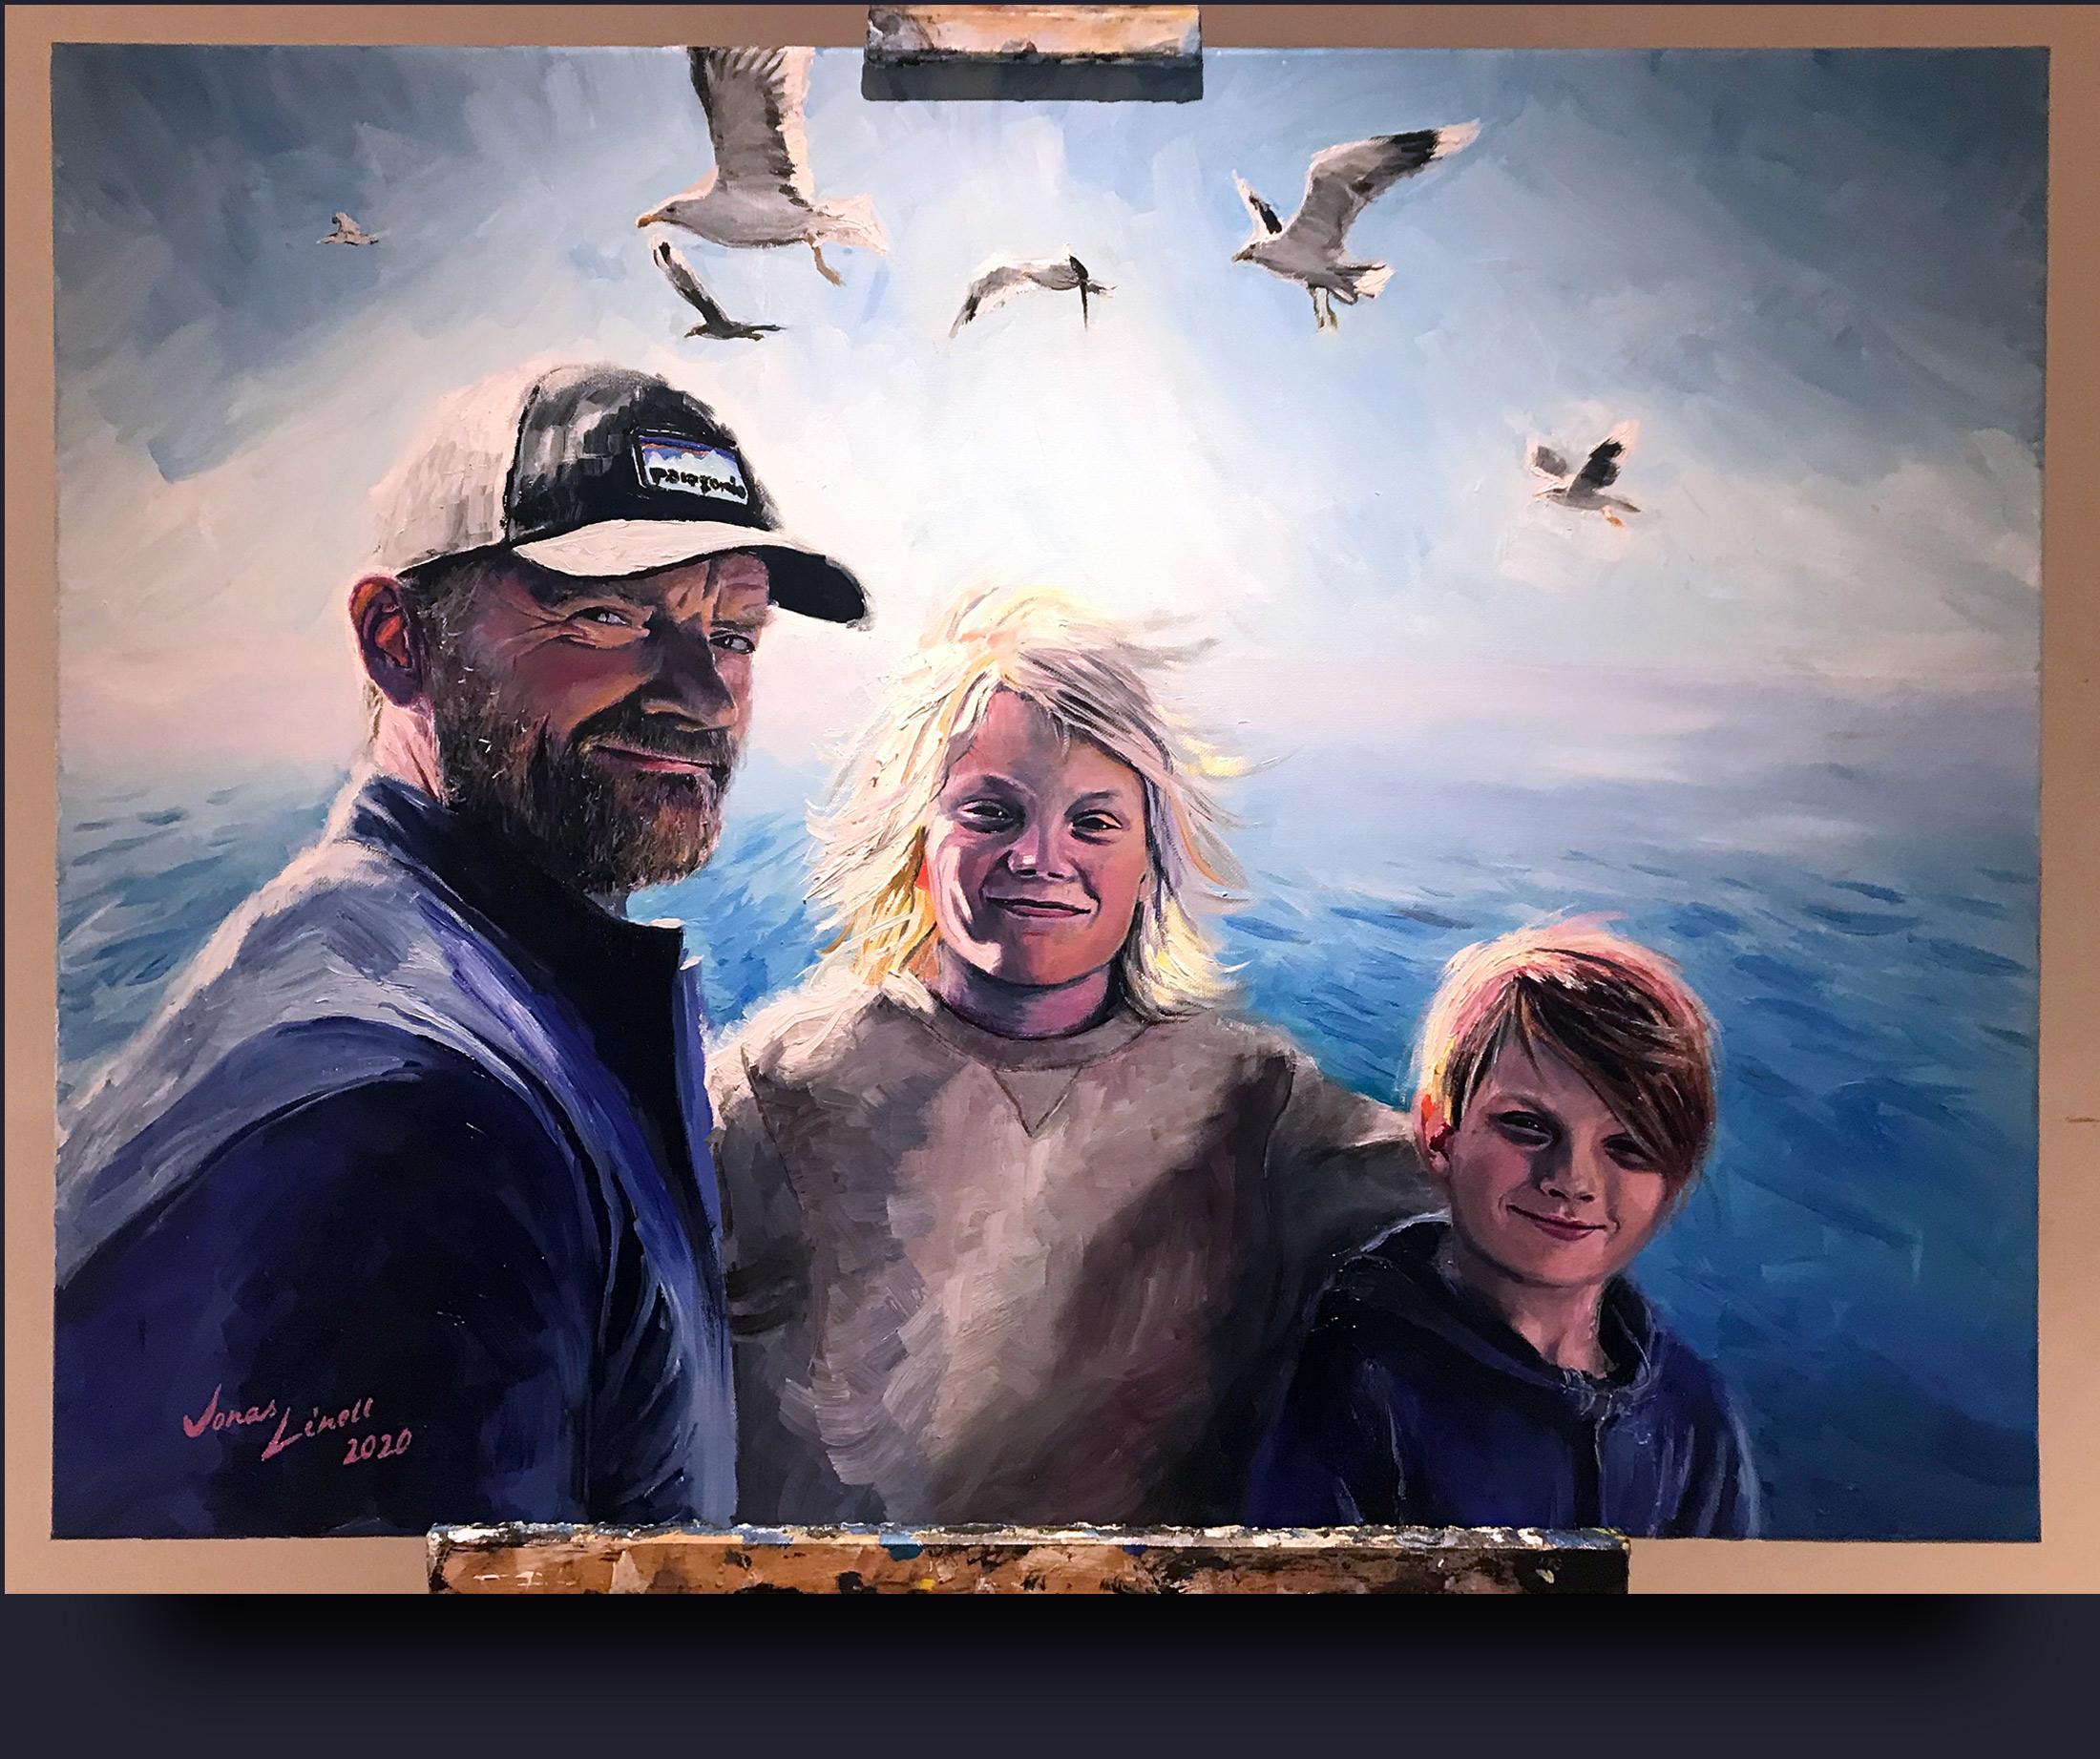 Frank Hvam portrait by Jonas Linell